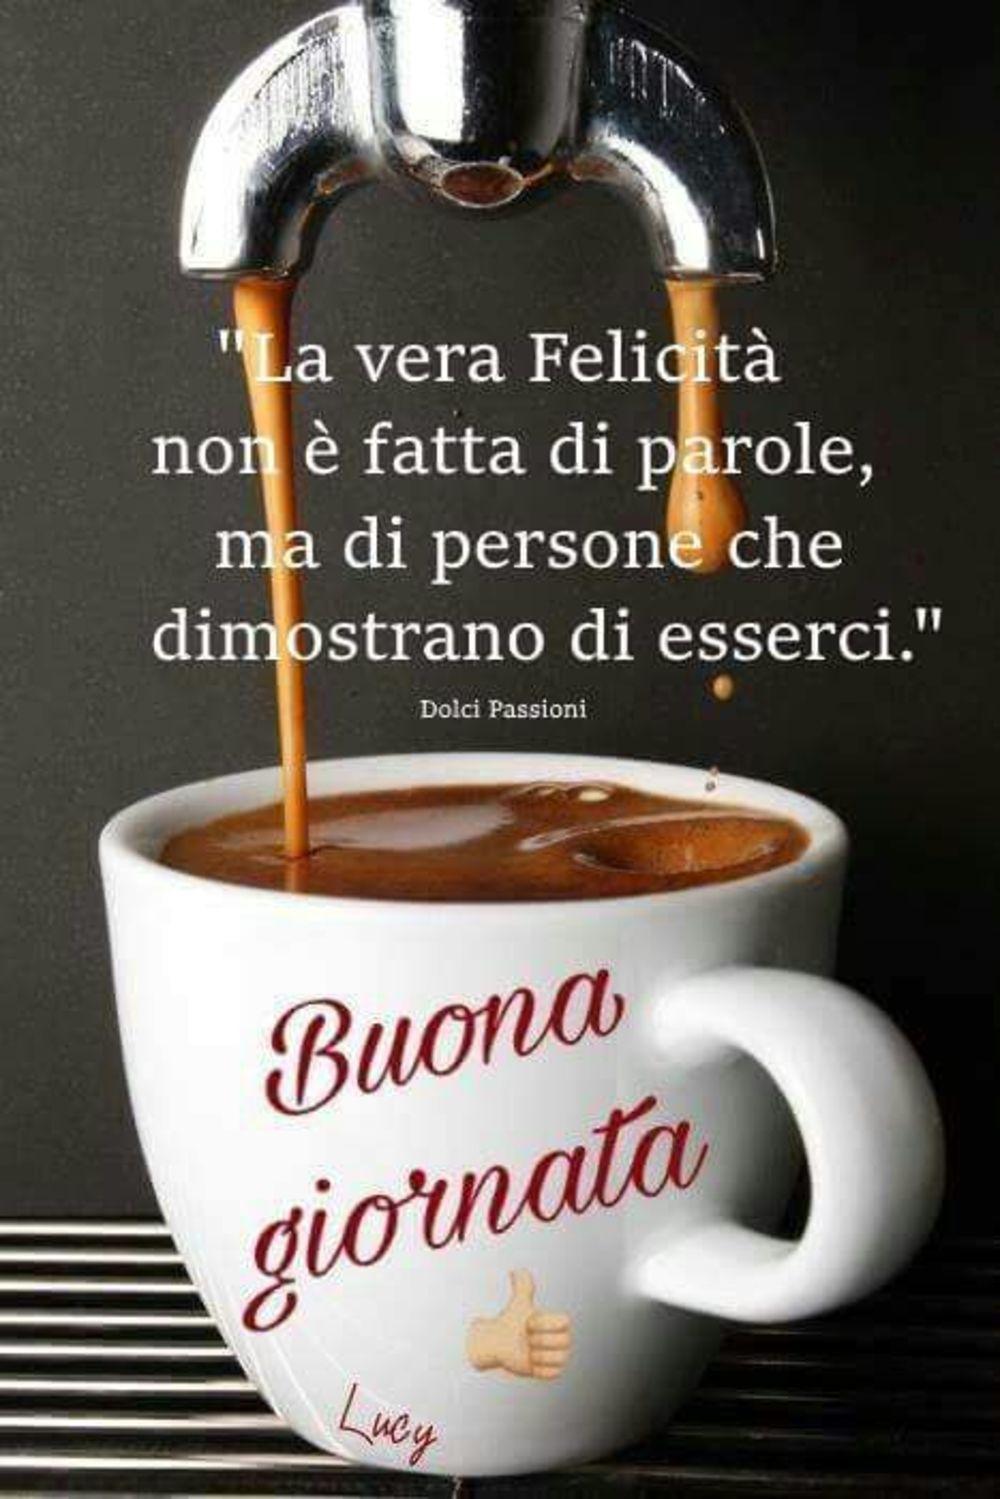 Buona Giornata caffè